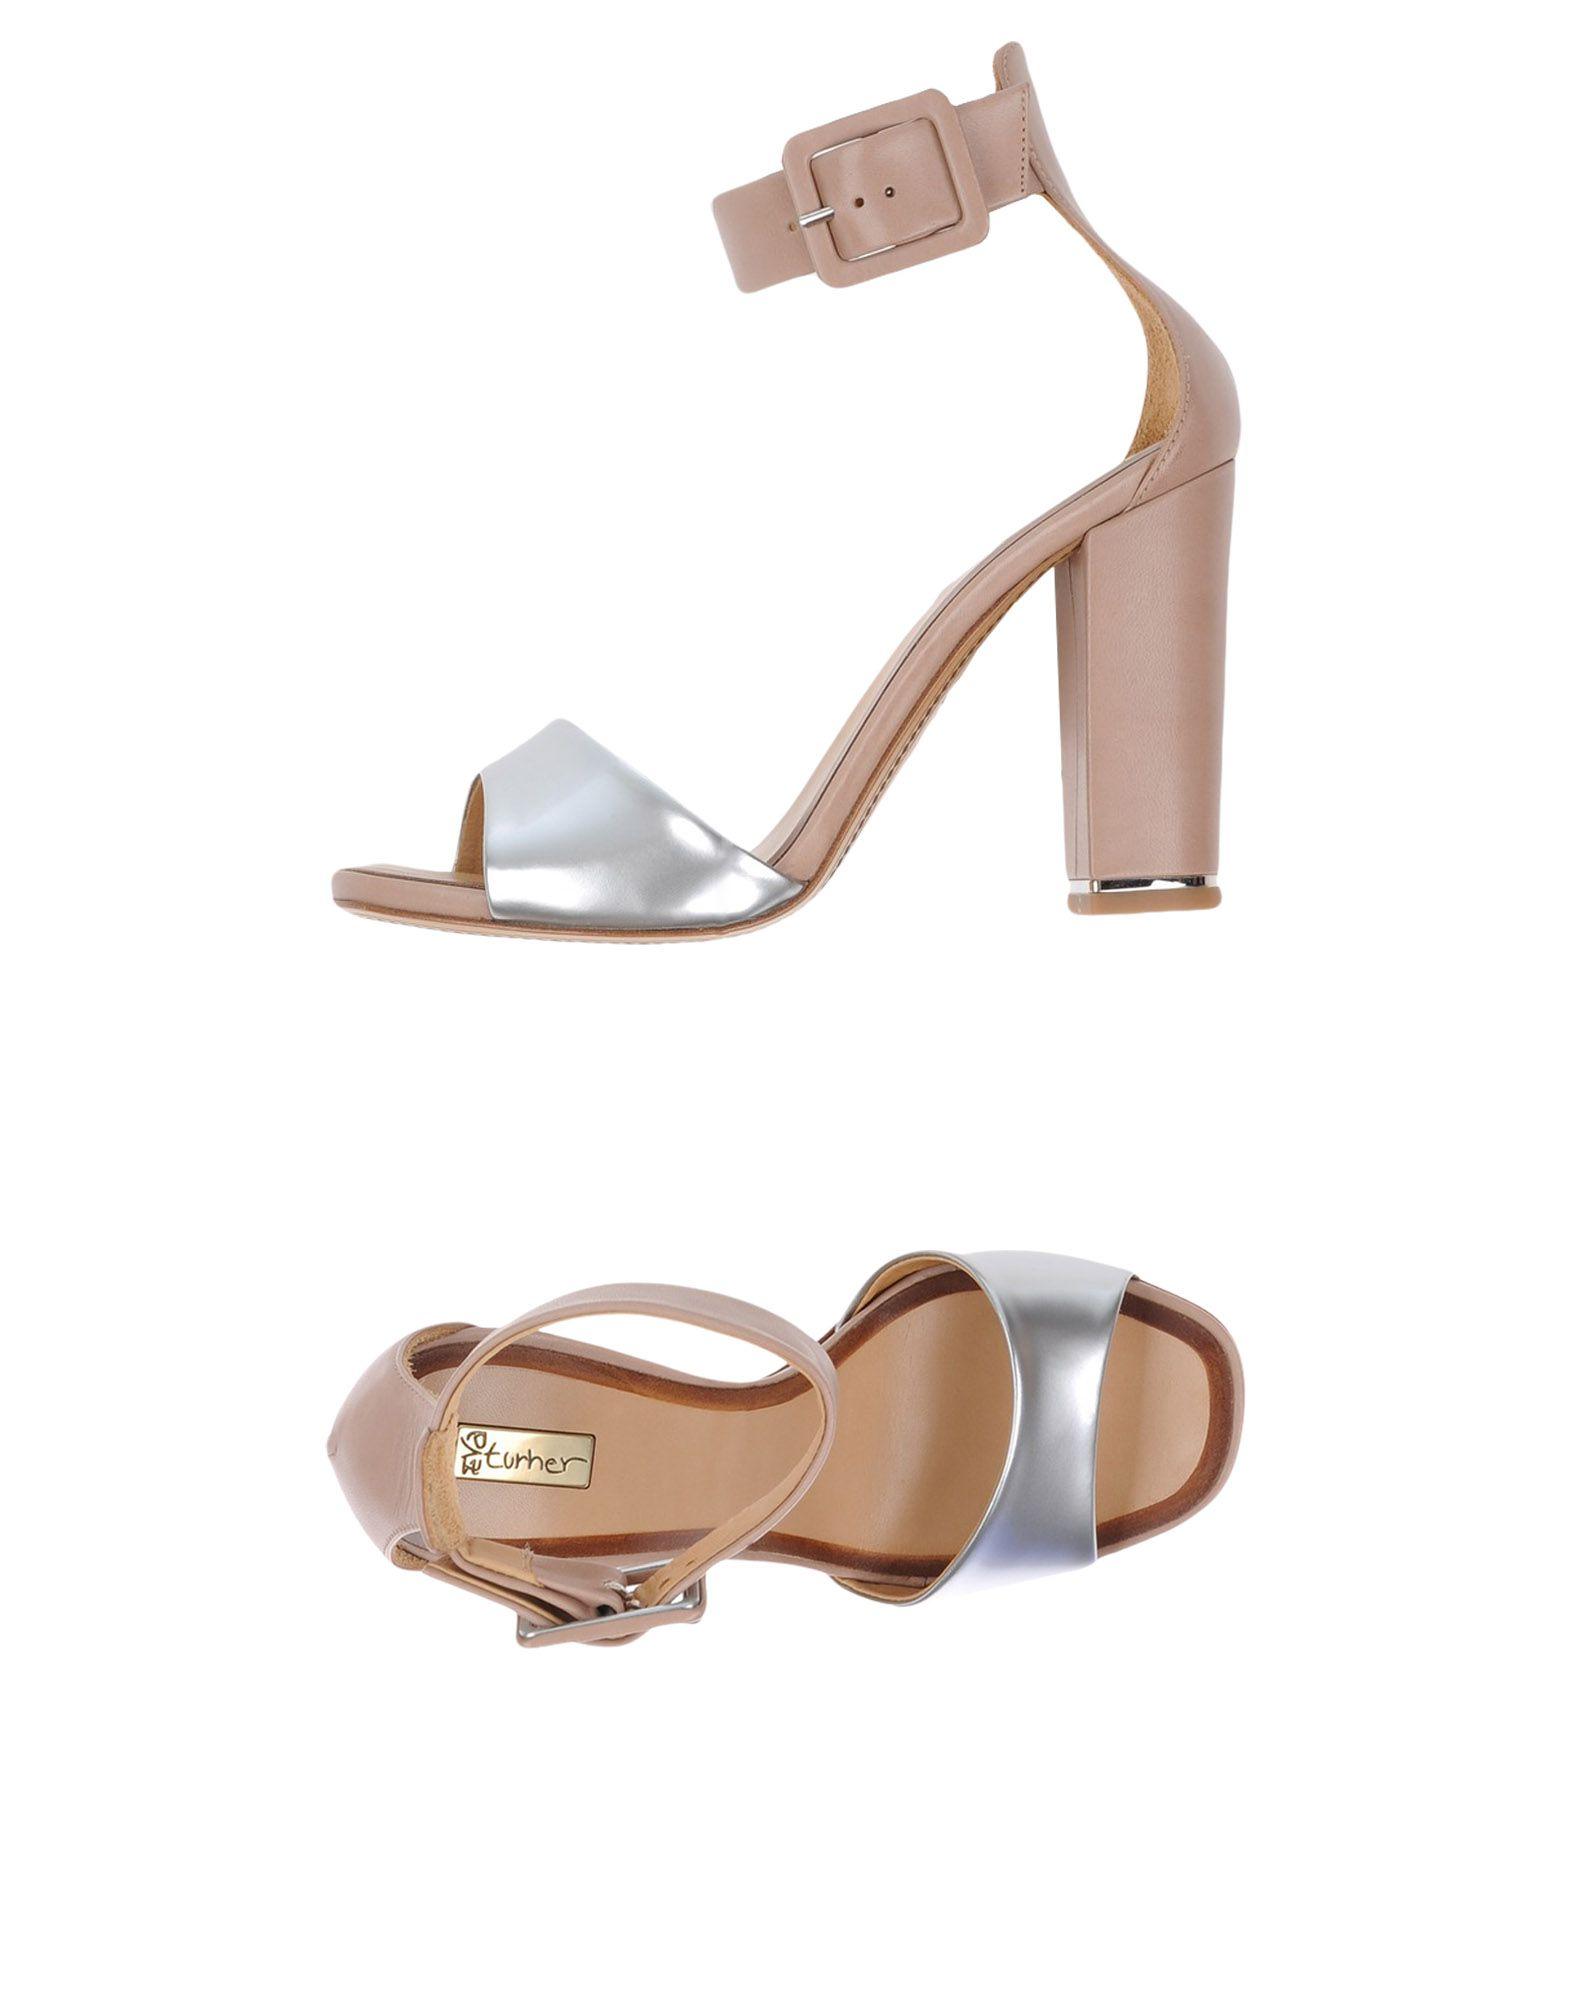 'Eva Turner Sandals